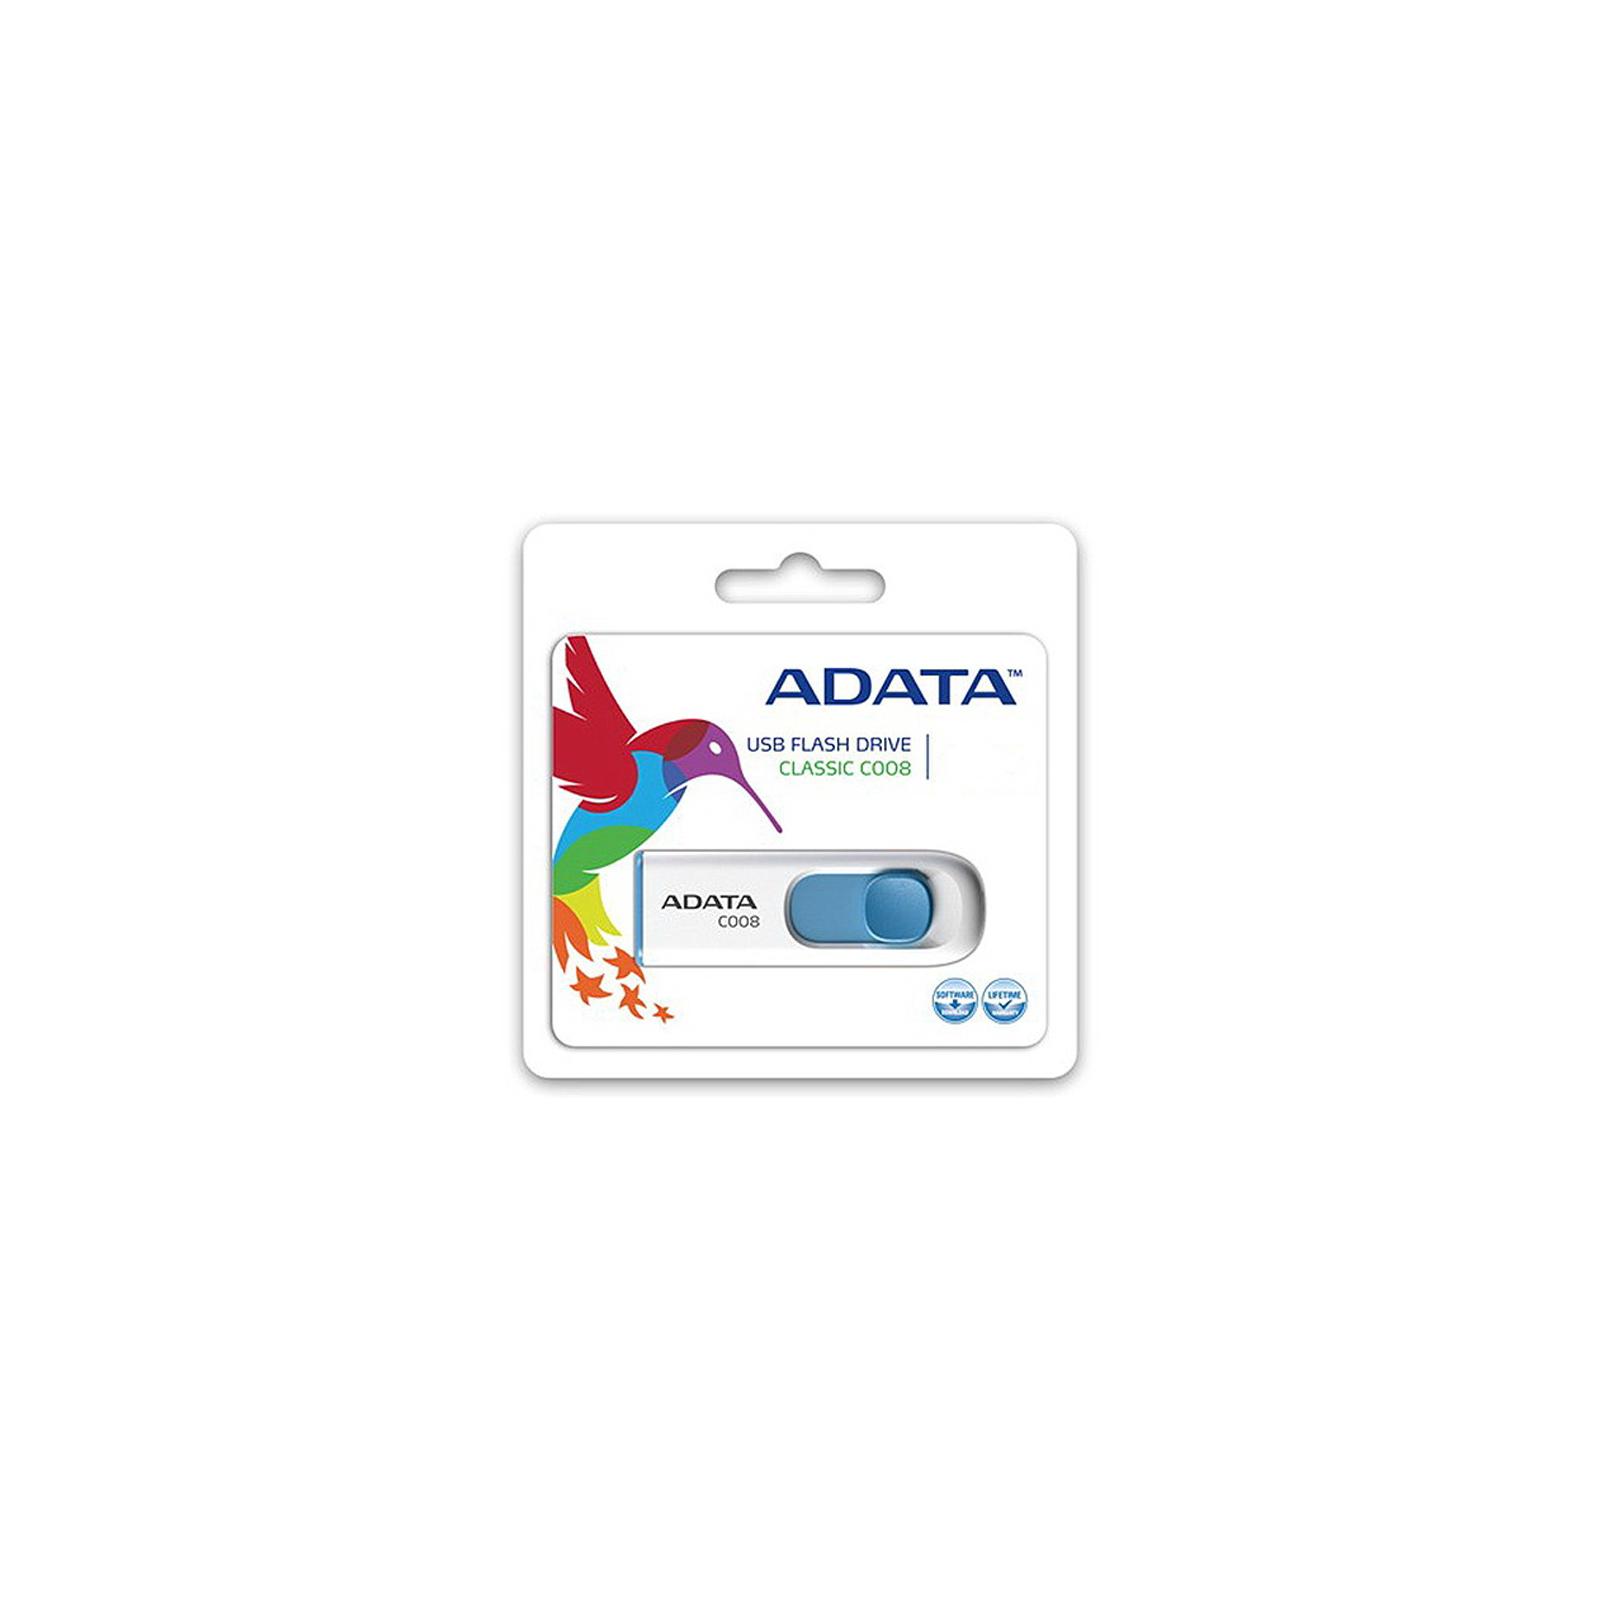 USB флеш накопитель ADATA 16Gb C008 Black/Red USB 2.0 (AC008-16G-RKD) изображение 5